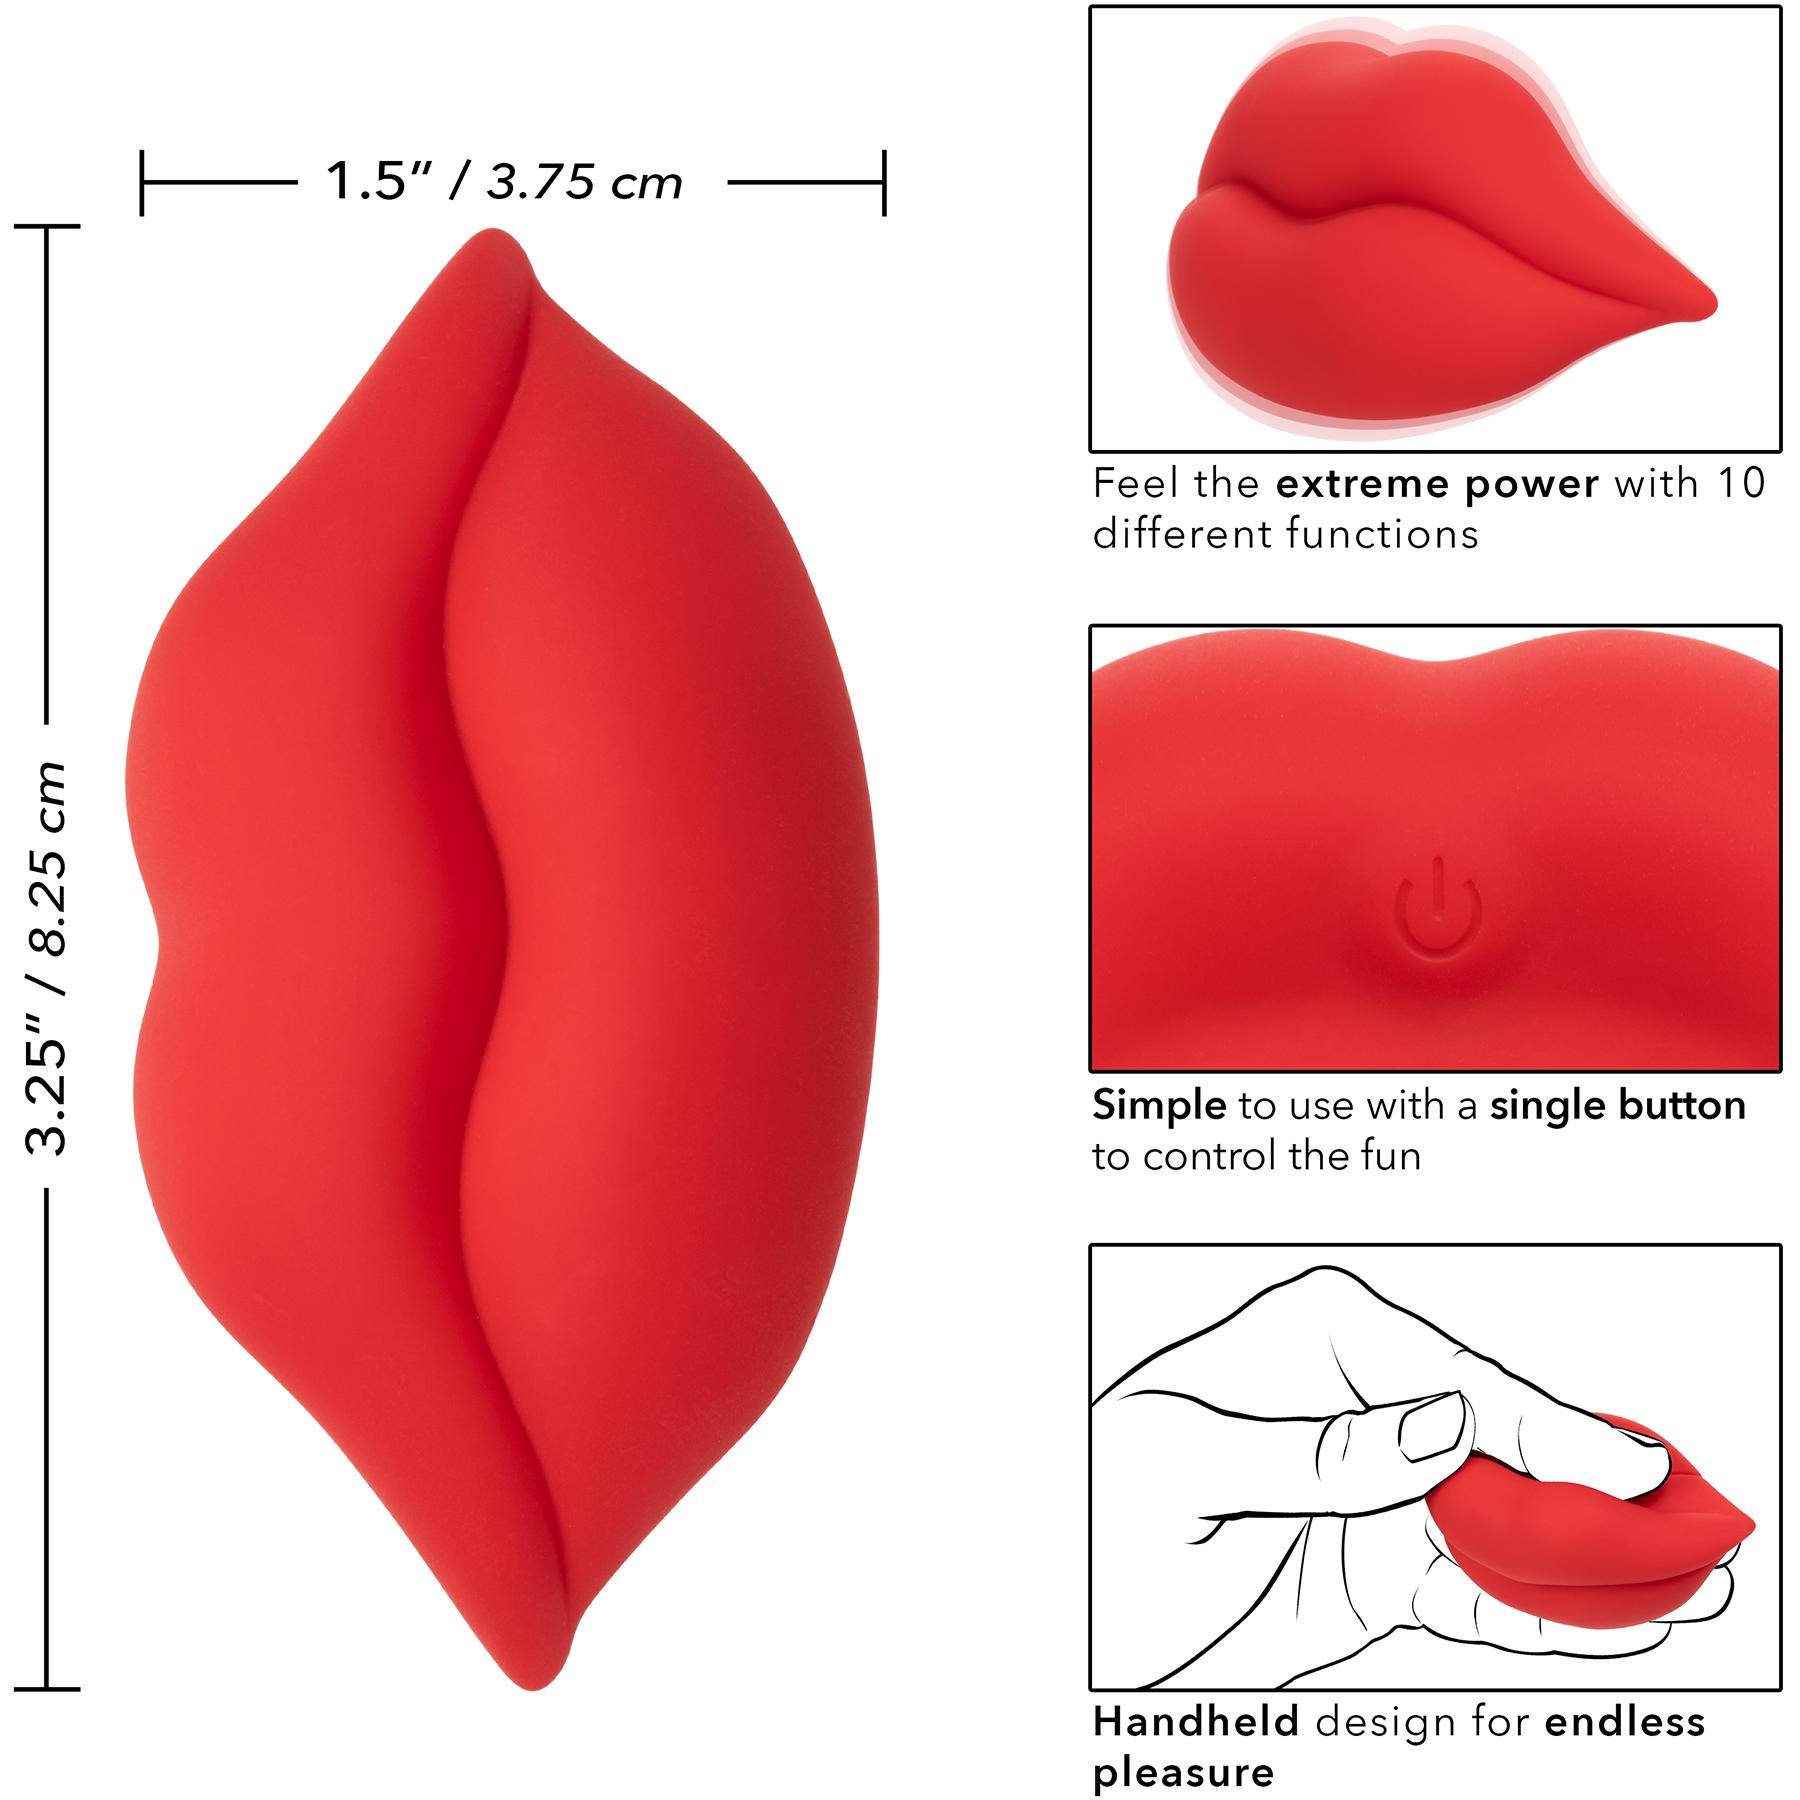 Naughty Bits Muah Silicone Rechargeable Mini Vibrator - Measurements